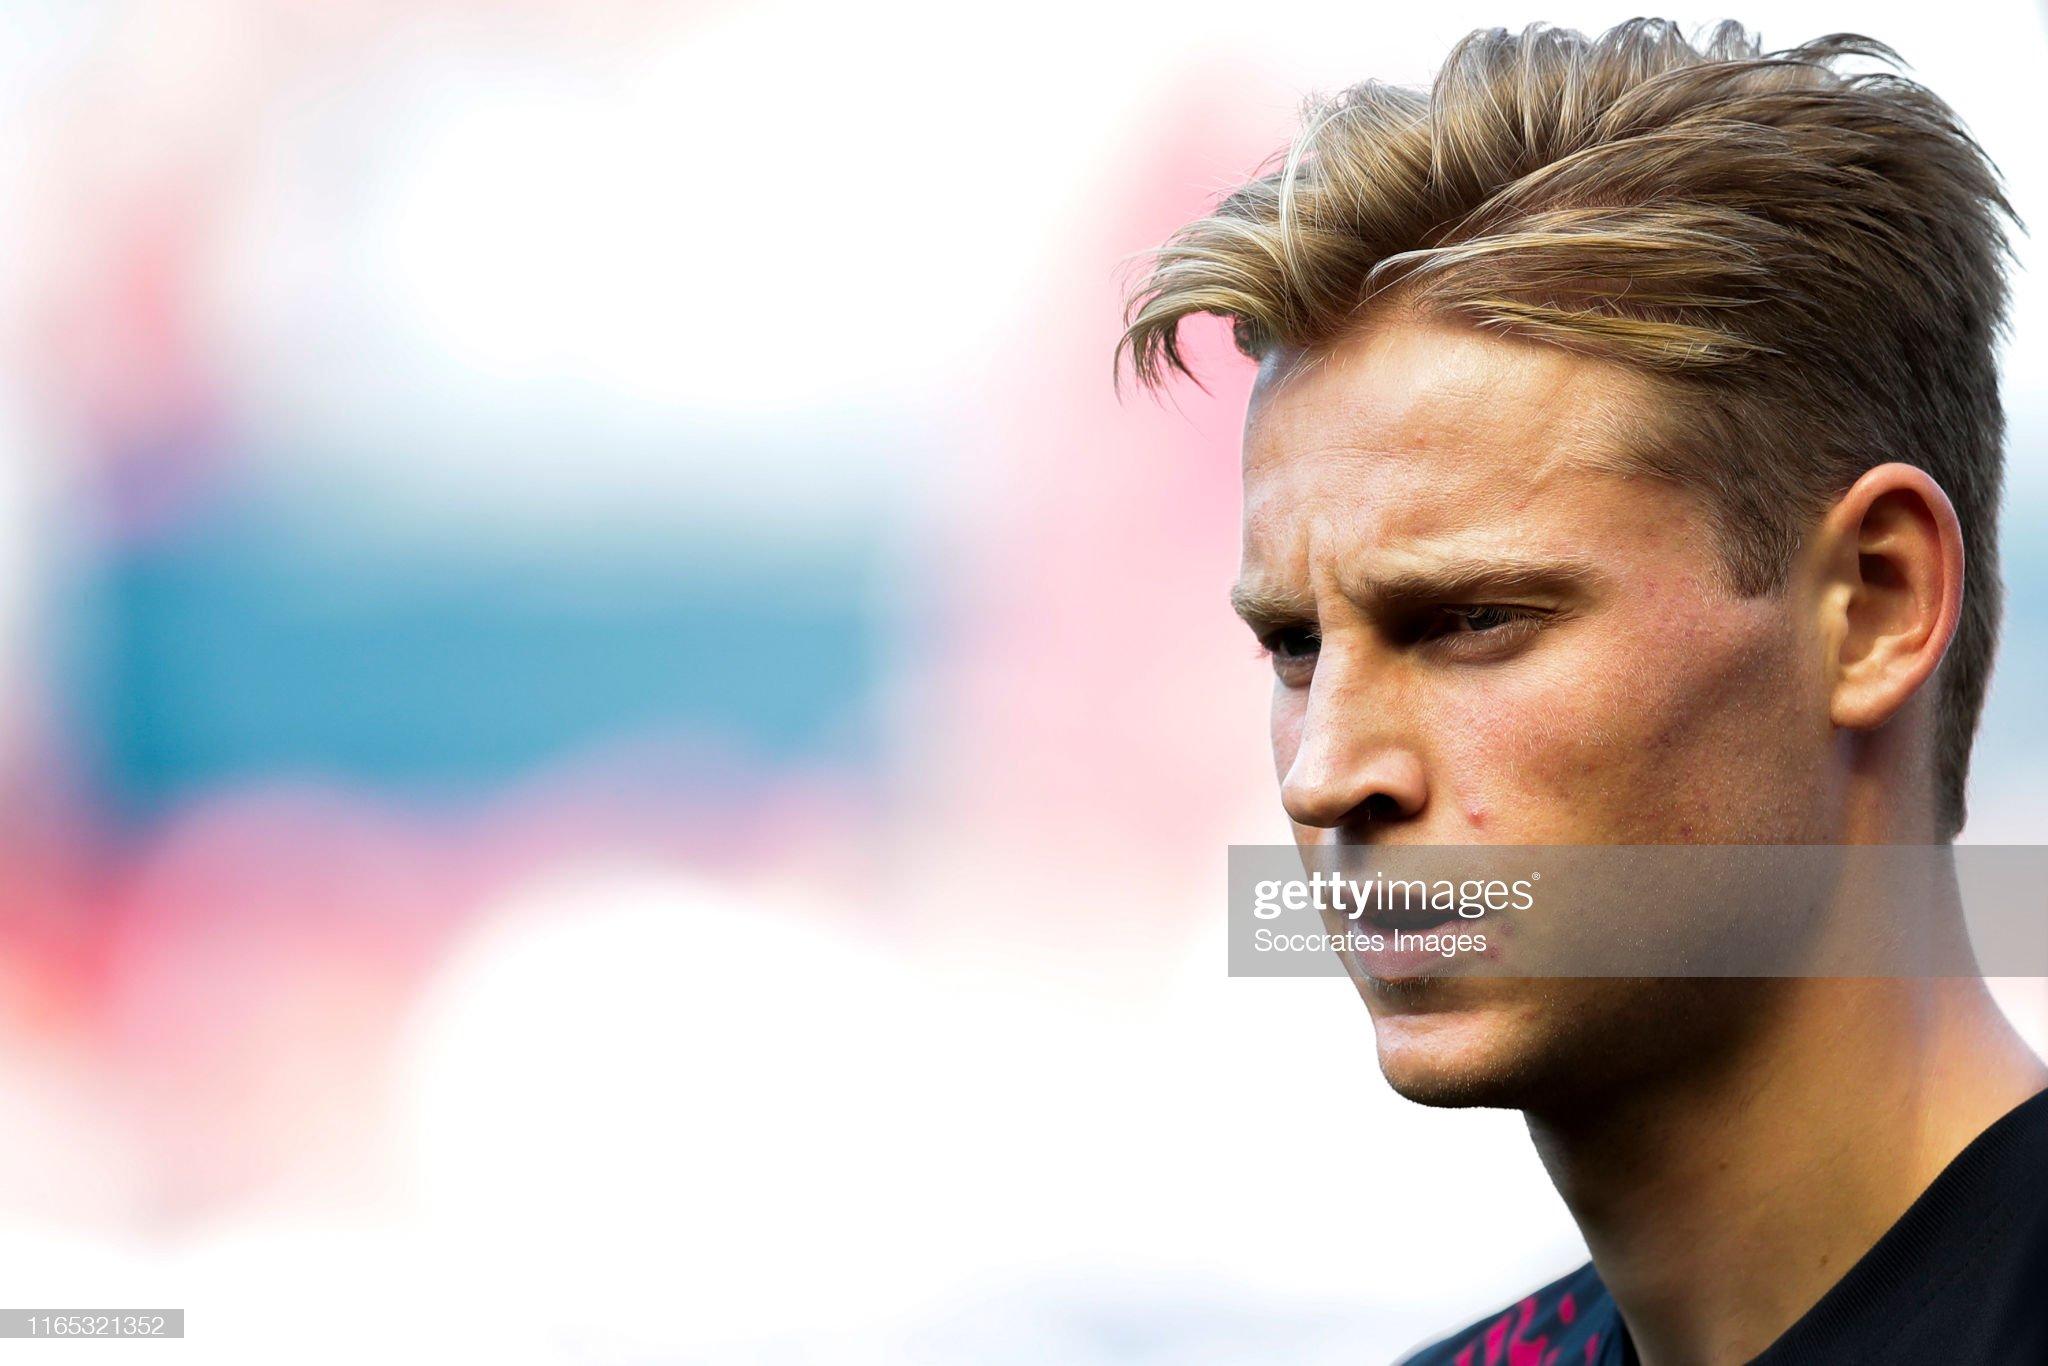 صور مباراة : أوساسونا - برشلونة 2-2 ( 31-08-2019 )  Frenkie-de-jong-of-fc-barcelona-during-the-la-liga-santander-match-picture-id1165321352?s=2048x2048